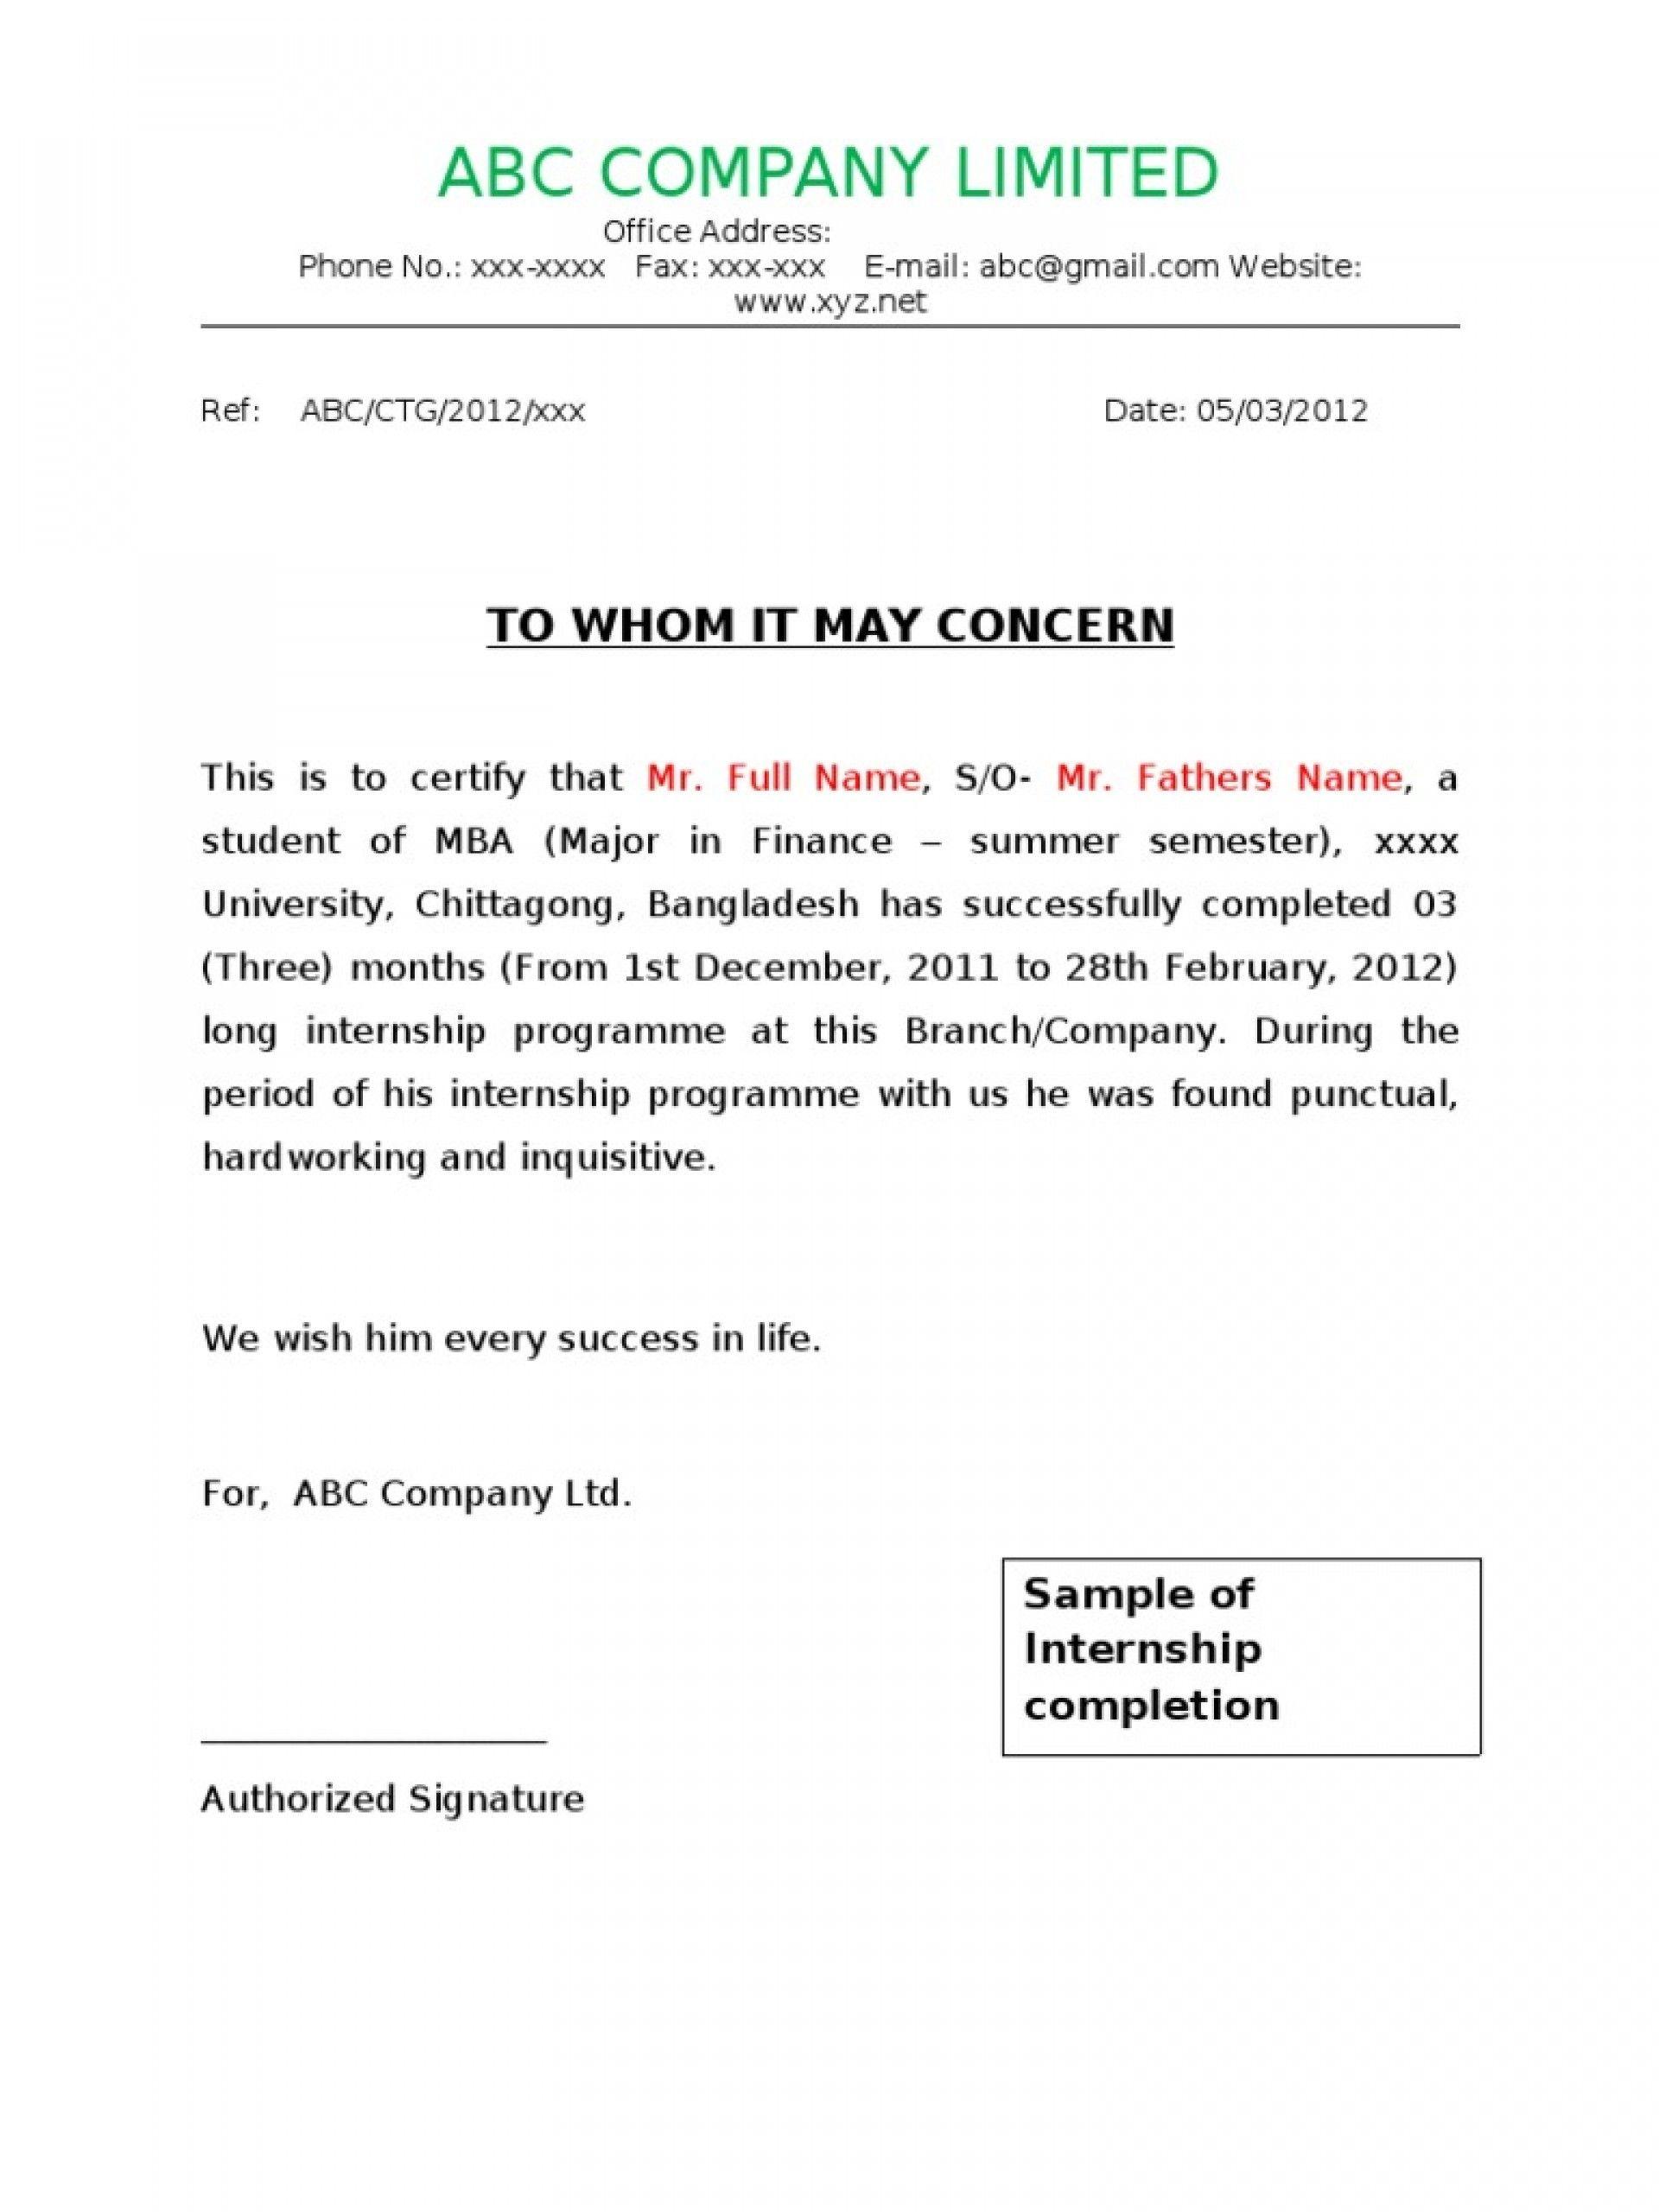 Valid Job Completion Certificate Letter Certificate Format Job